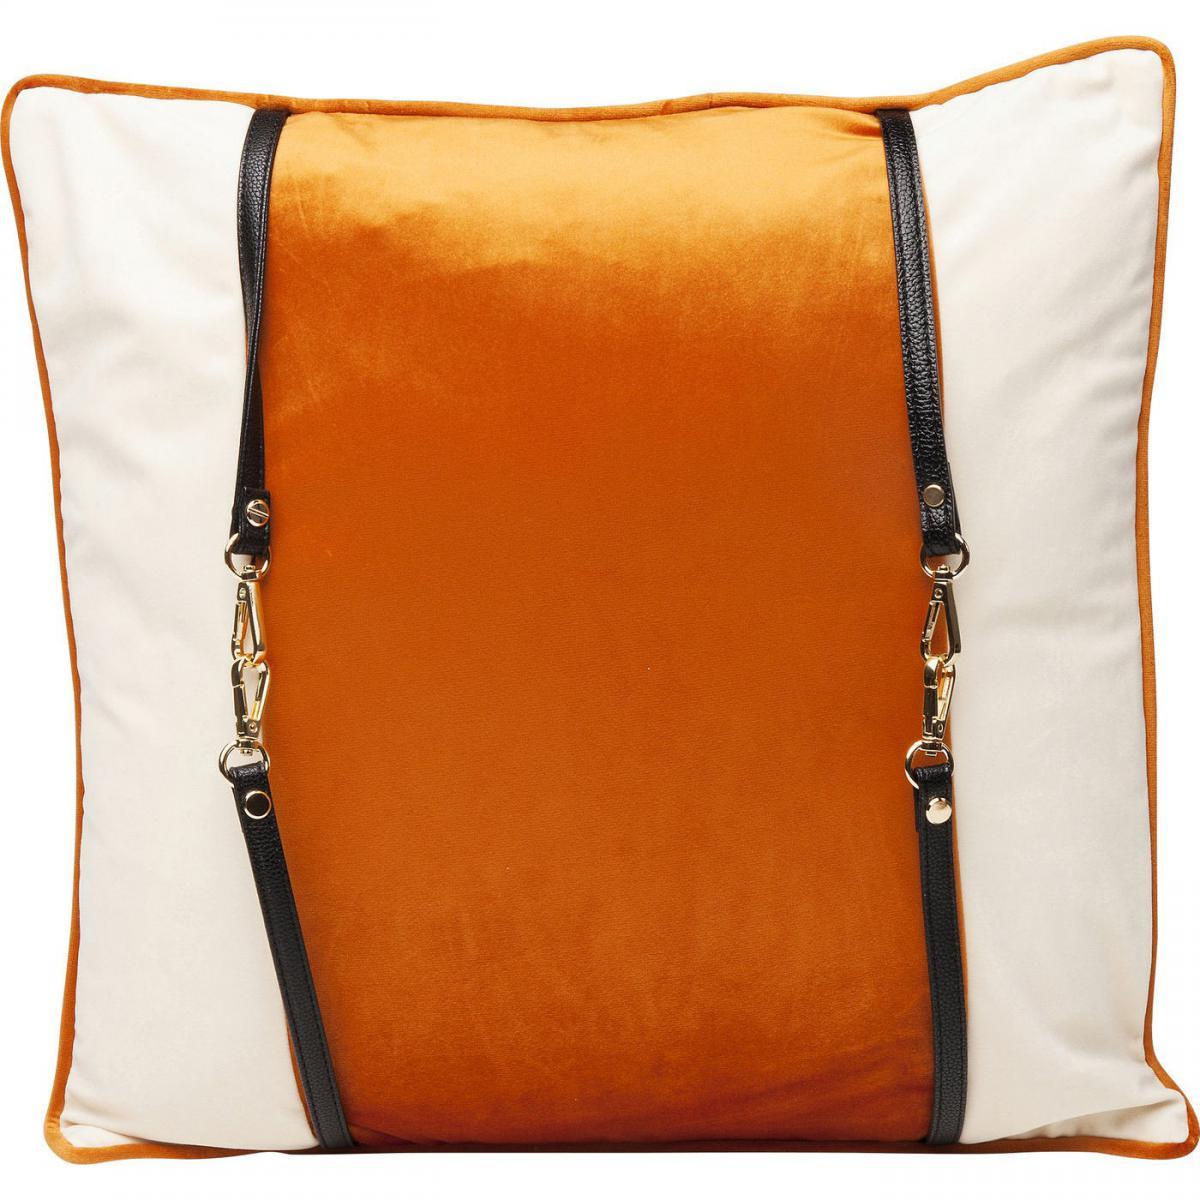 Karedesign Coussin orange Classy Belt 45x45cm Kare Design